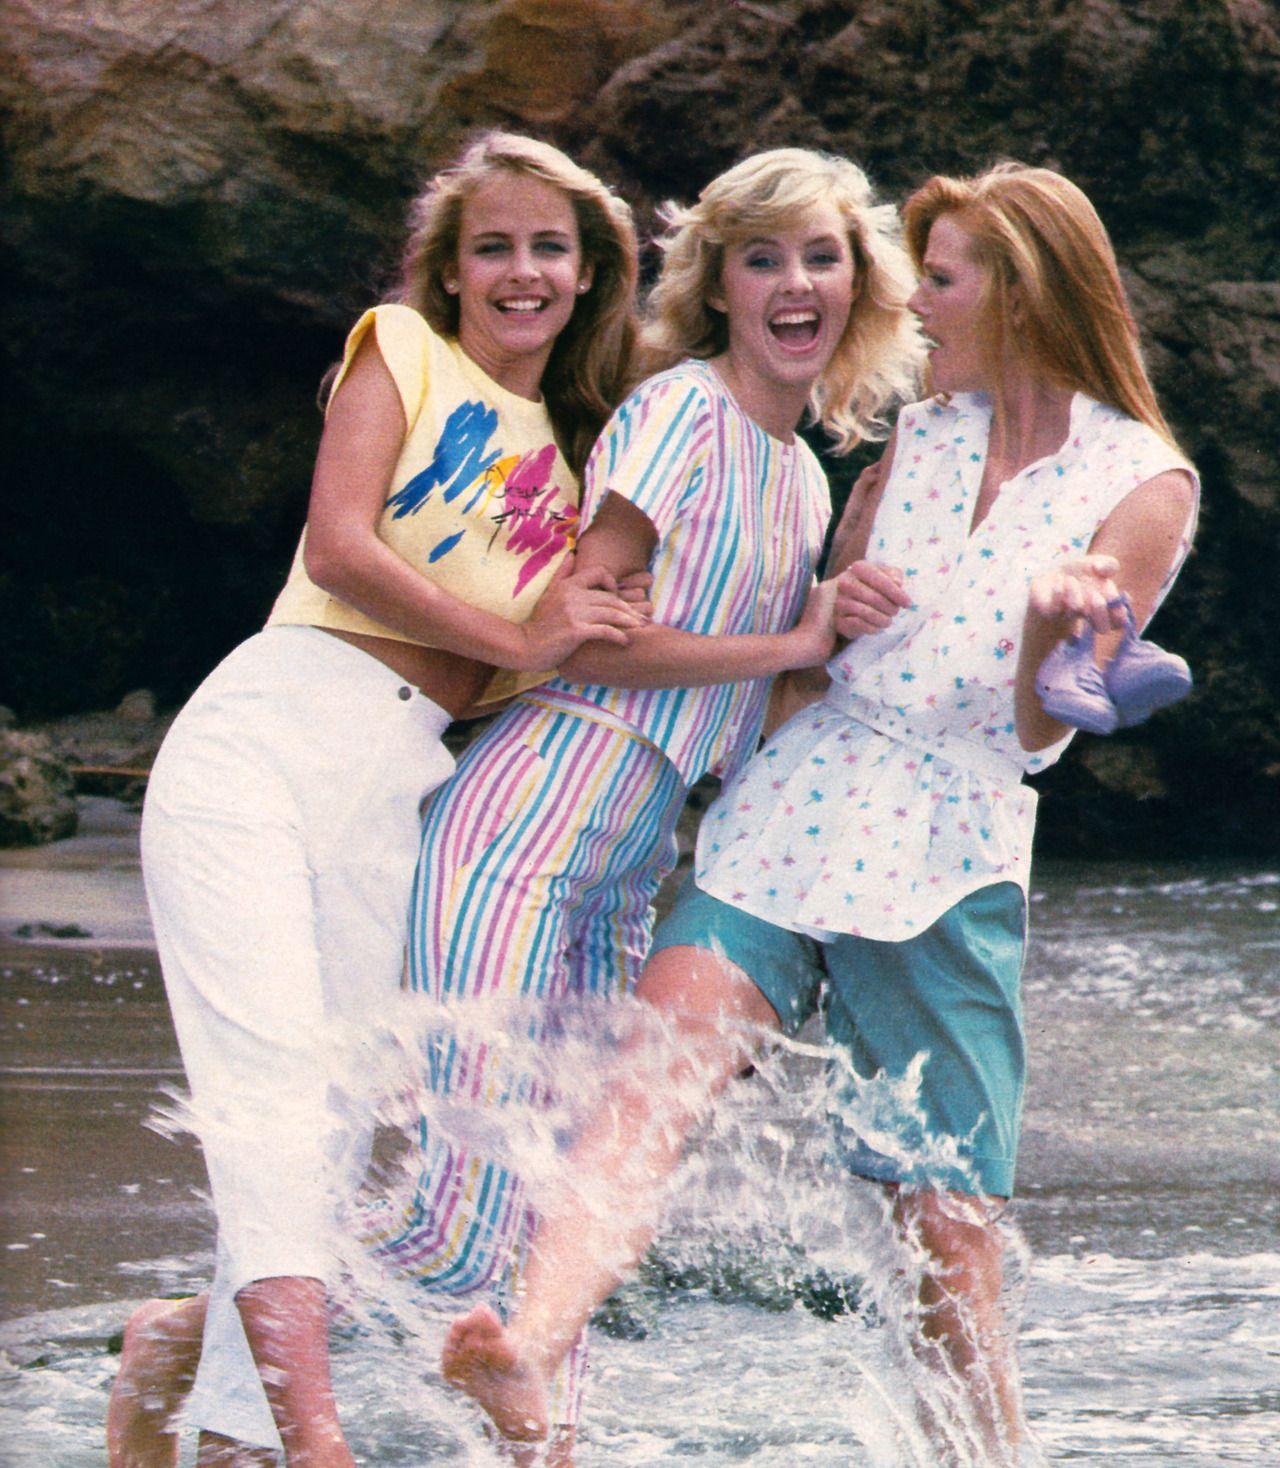 Мagazine Fashion 17 Only Sweet Girls: Senior Year Of High School: Ah, Memories... Ocean Pacfic